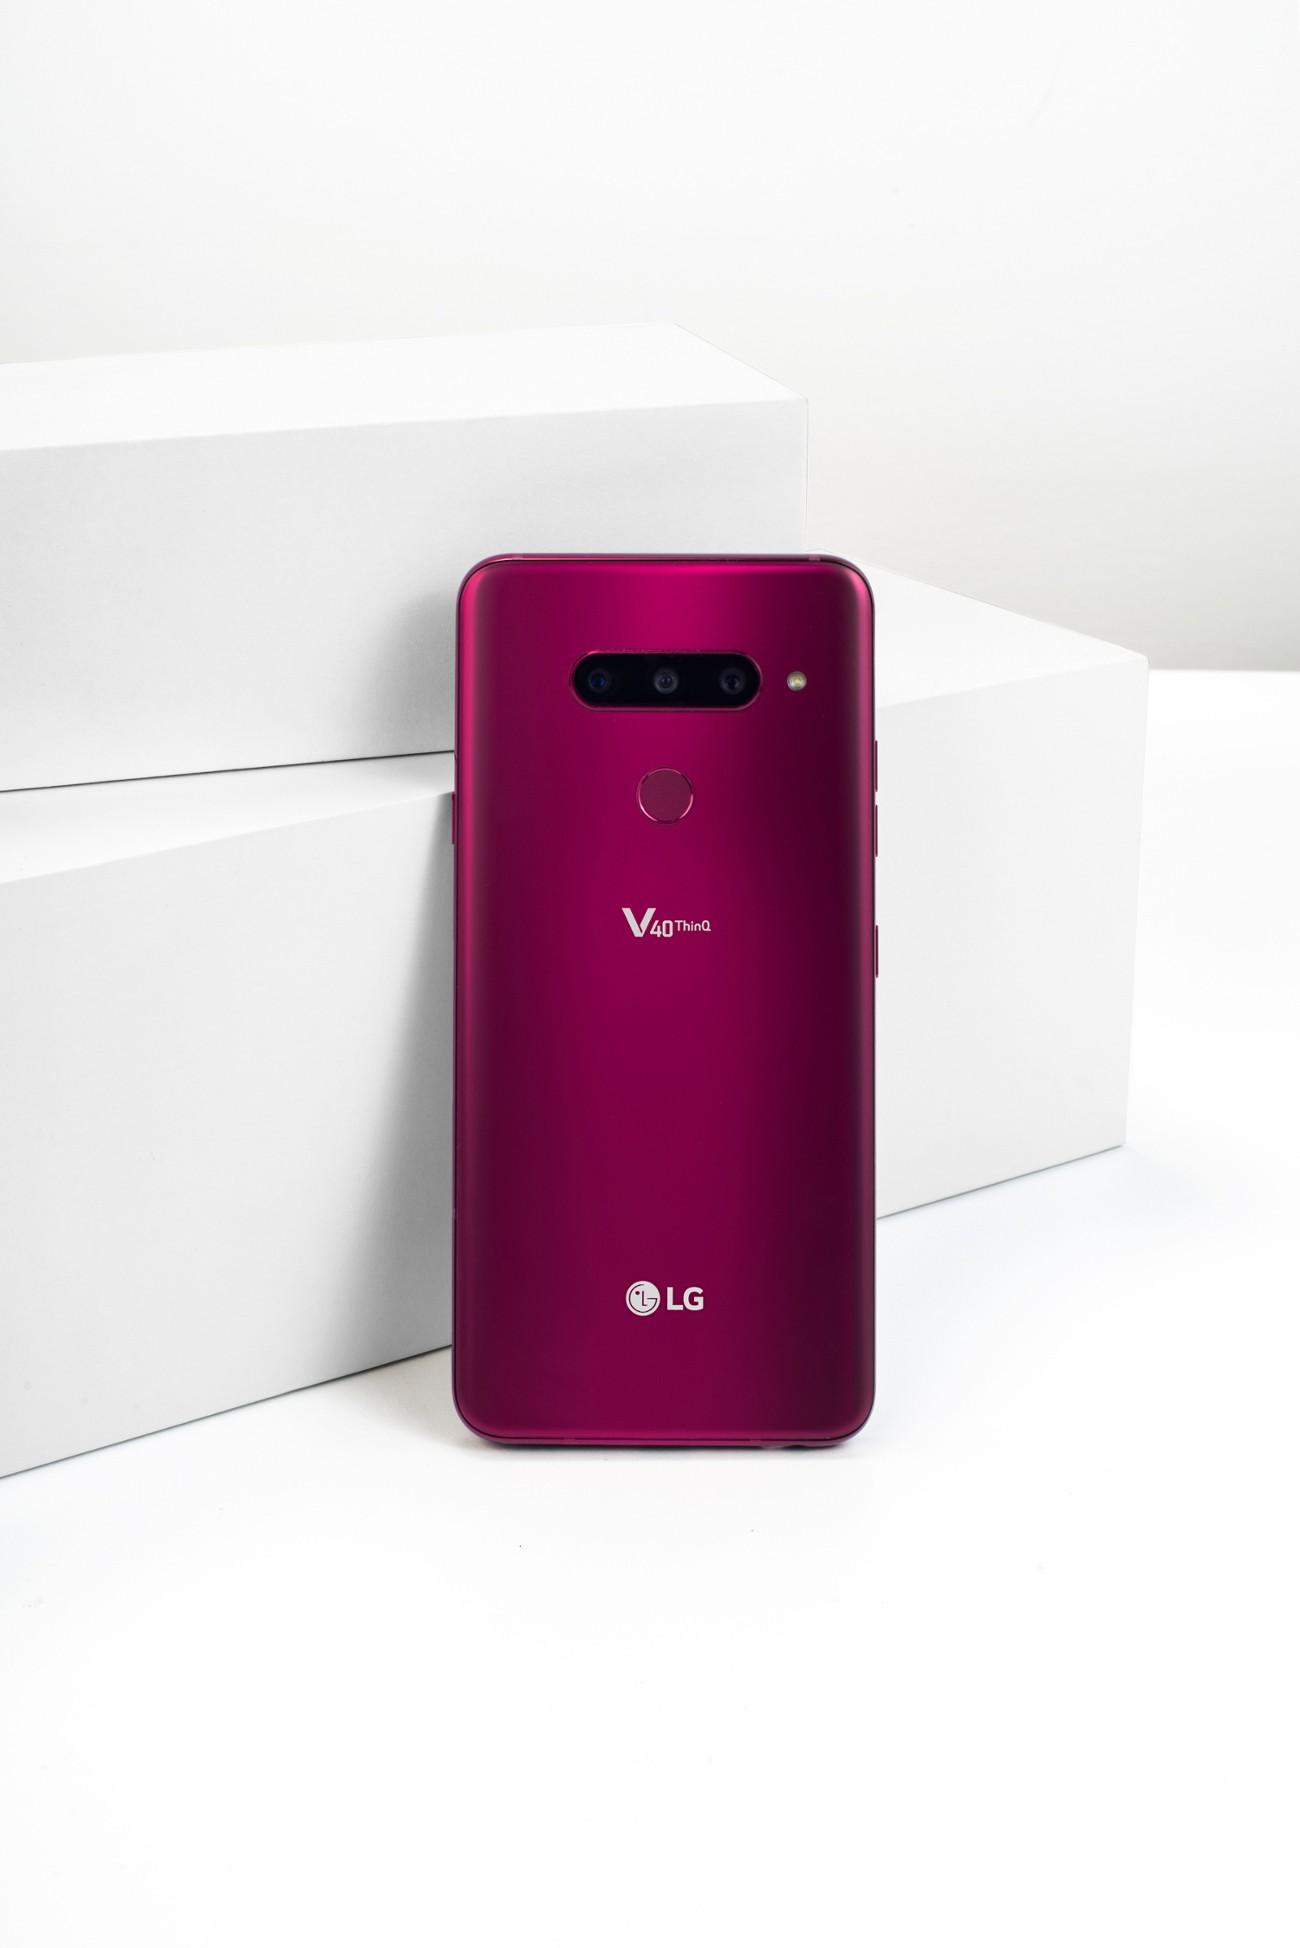 LG DELIVERS ULTIMATE FIVE CAMERA SMARTPHONE WITH LG V40